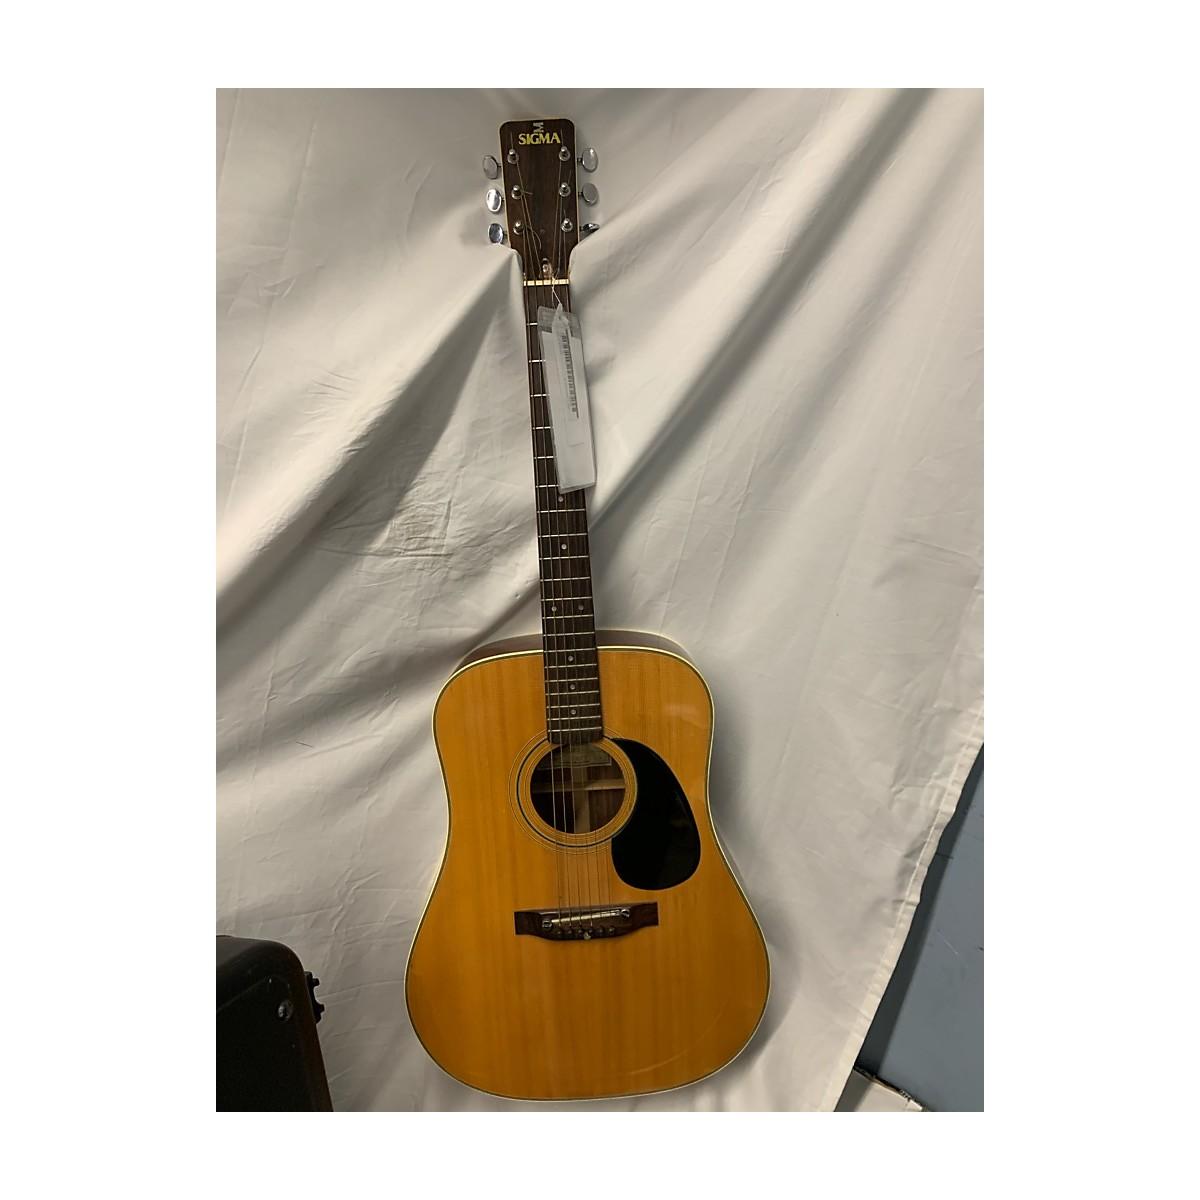 SIGMA 1972 DR7 Acoustic Guitar